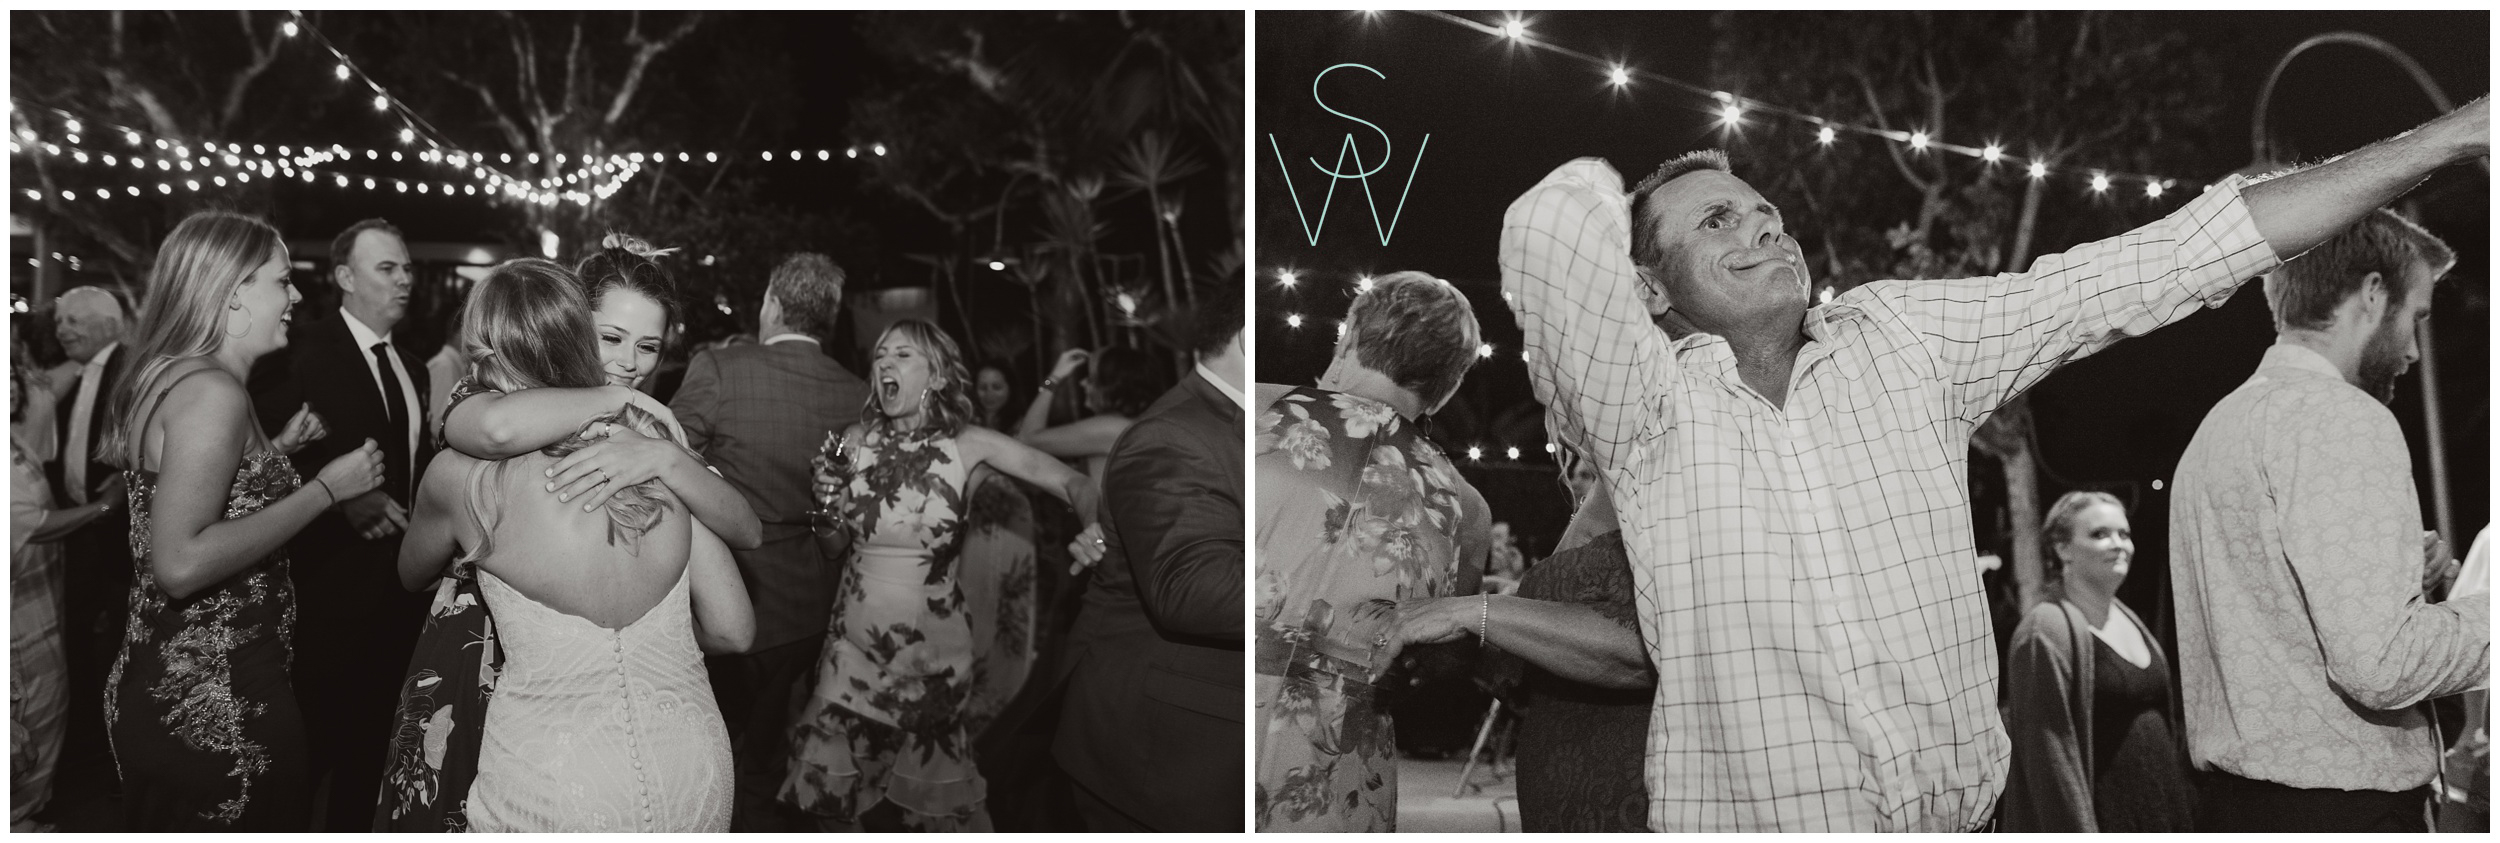 shewanders.san.diego.wedding.brigatine.isari-200.jpg